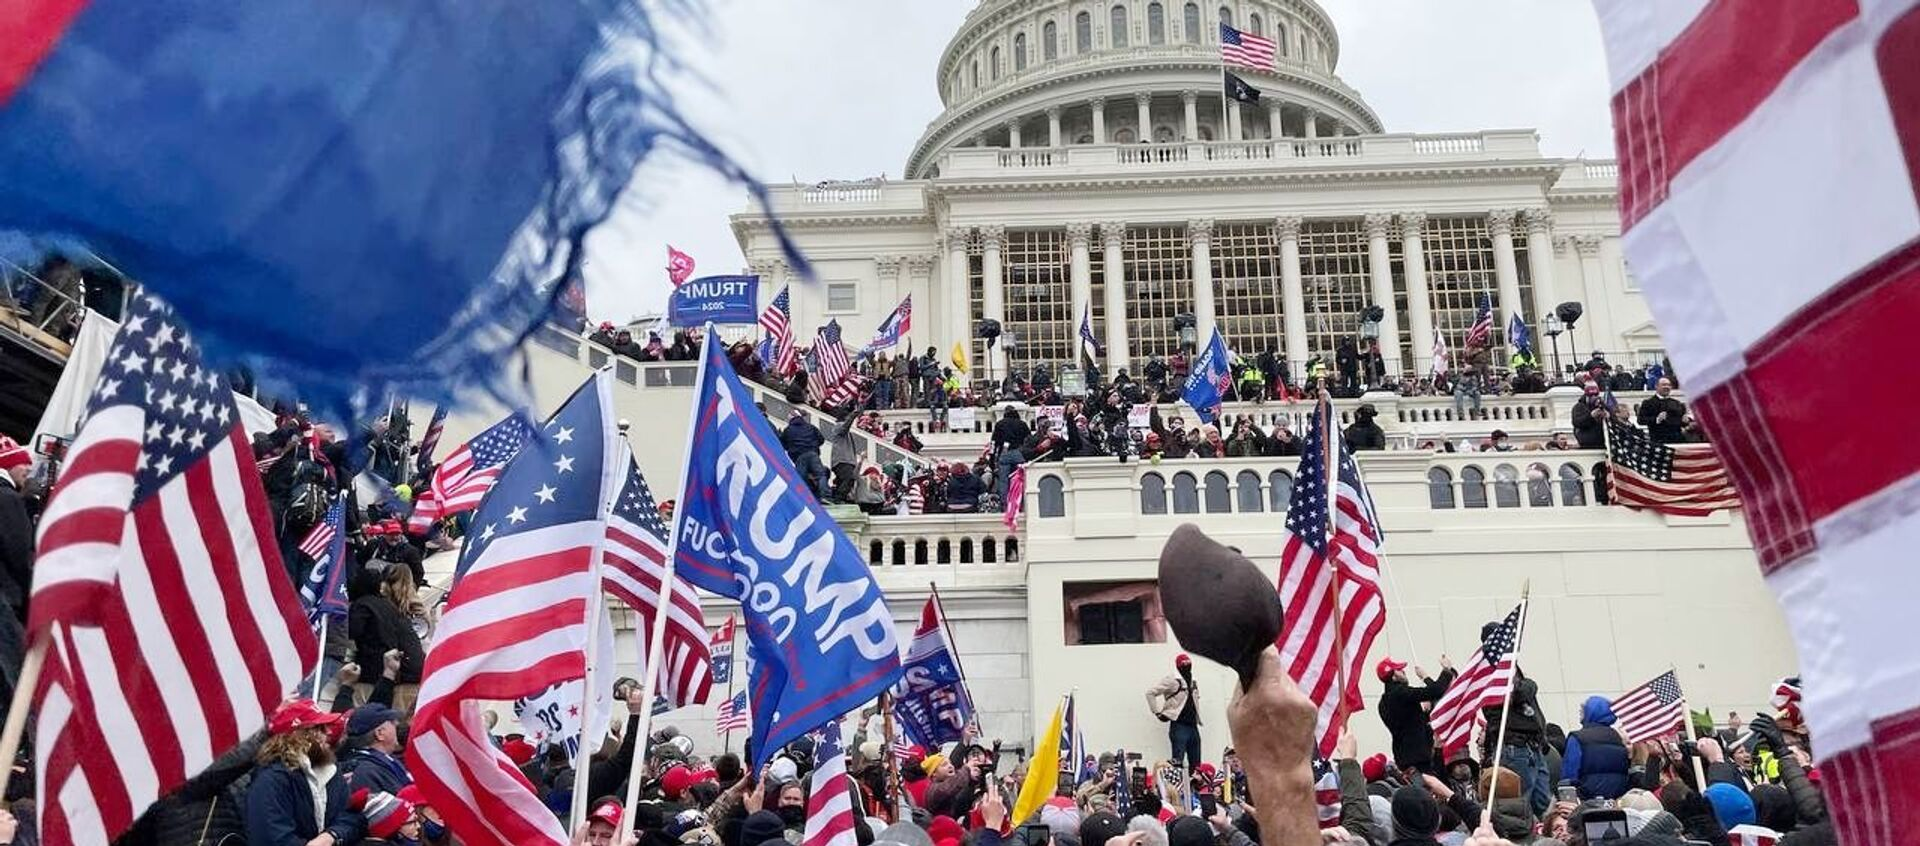 Акция протеста сторонников Д. Трампа в Вашингтоне - Sputnik Абхазия, 1920, 18.01.2021